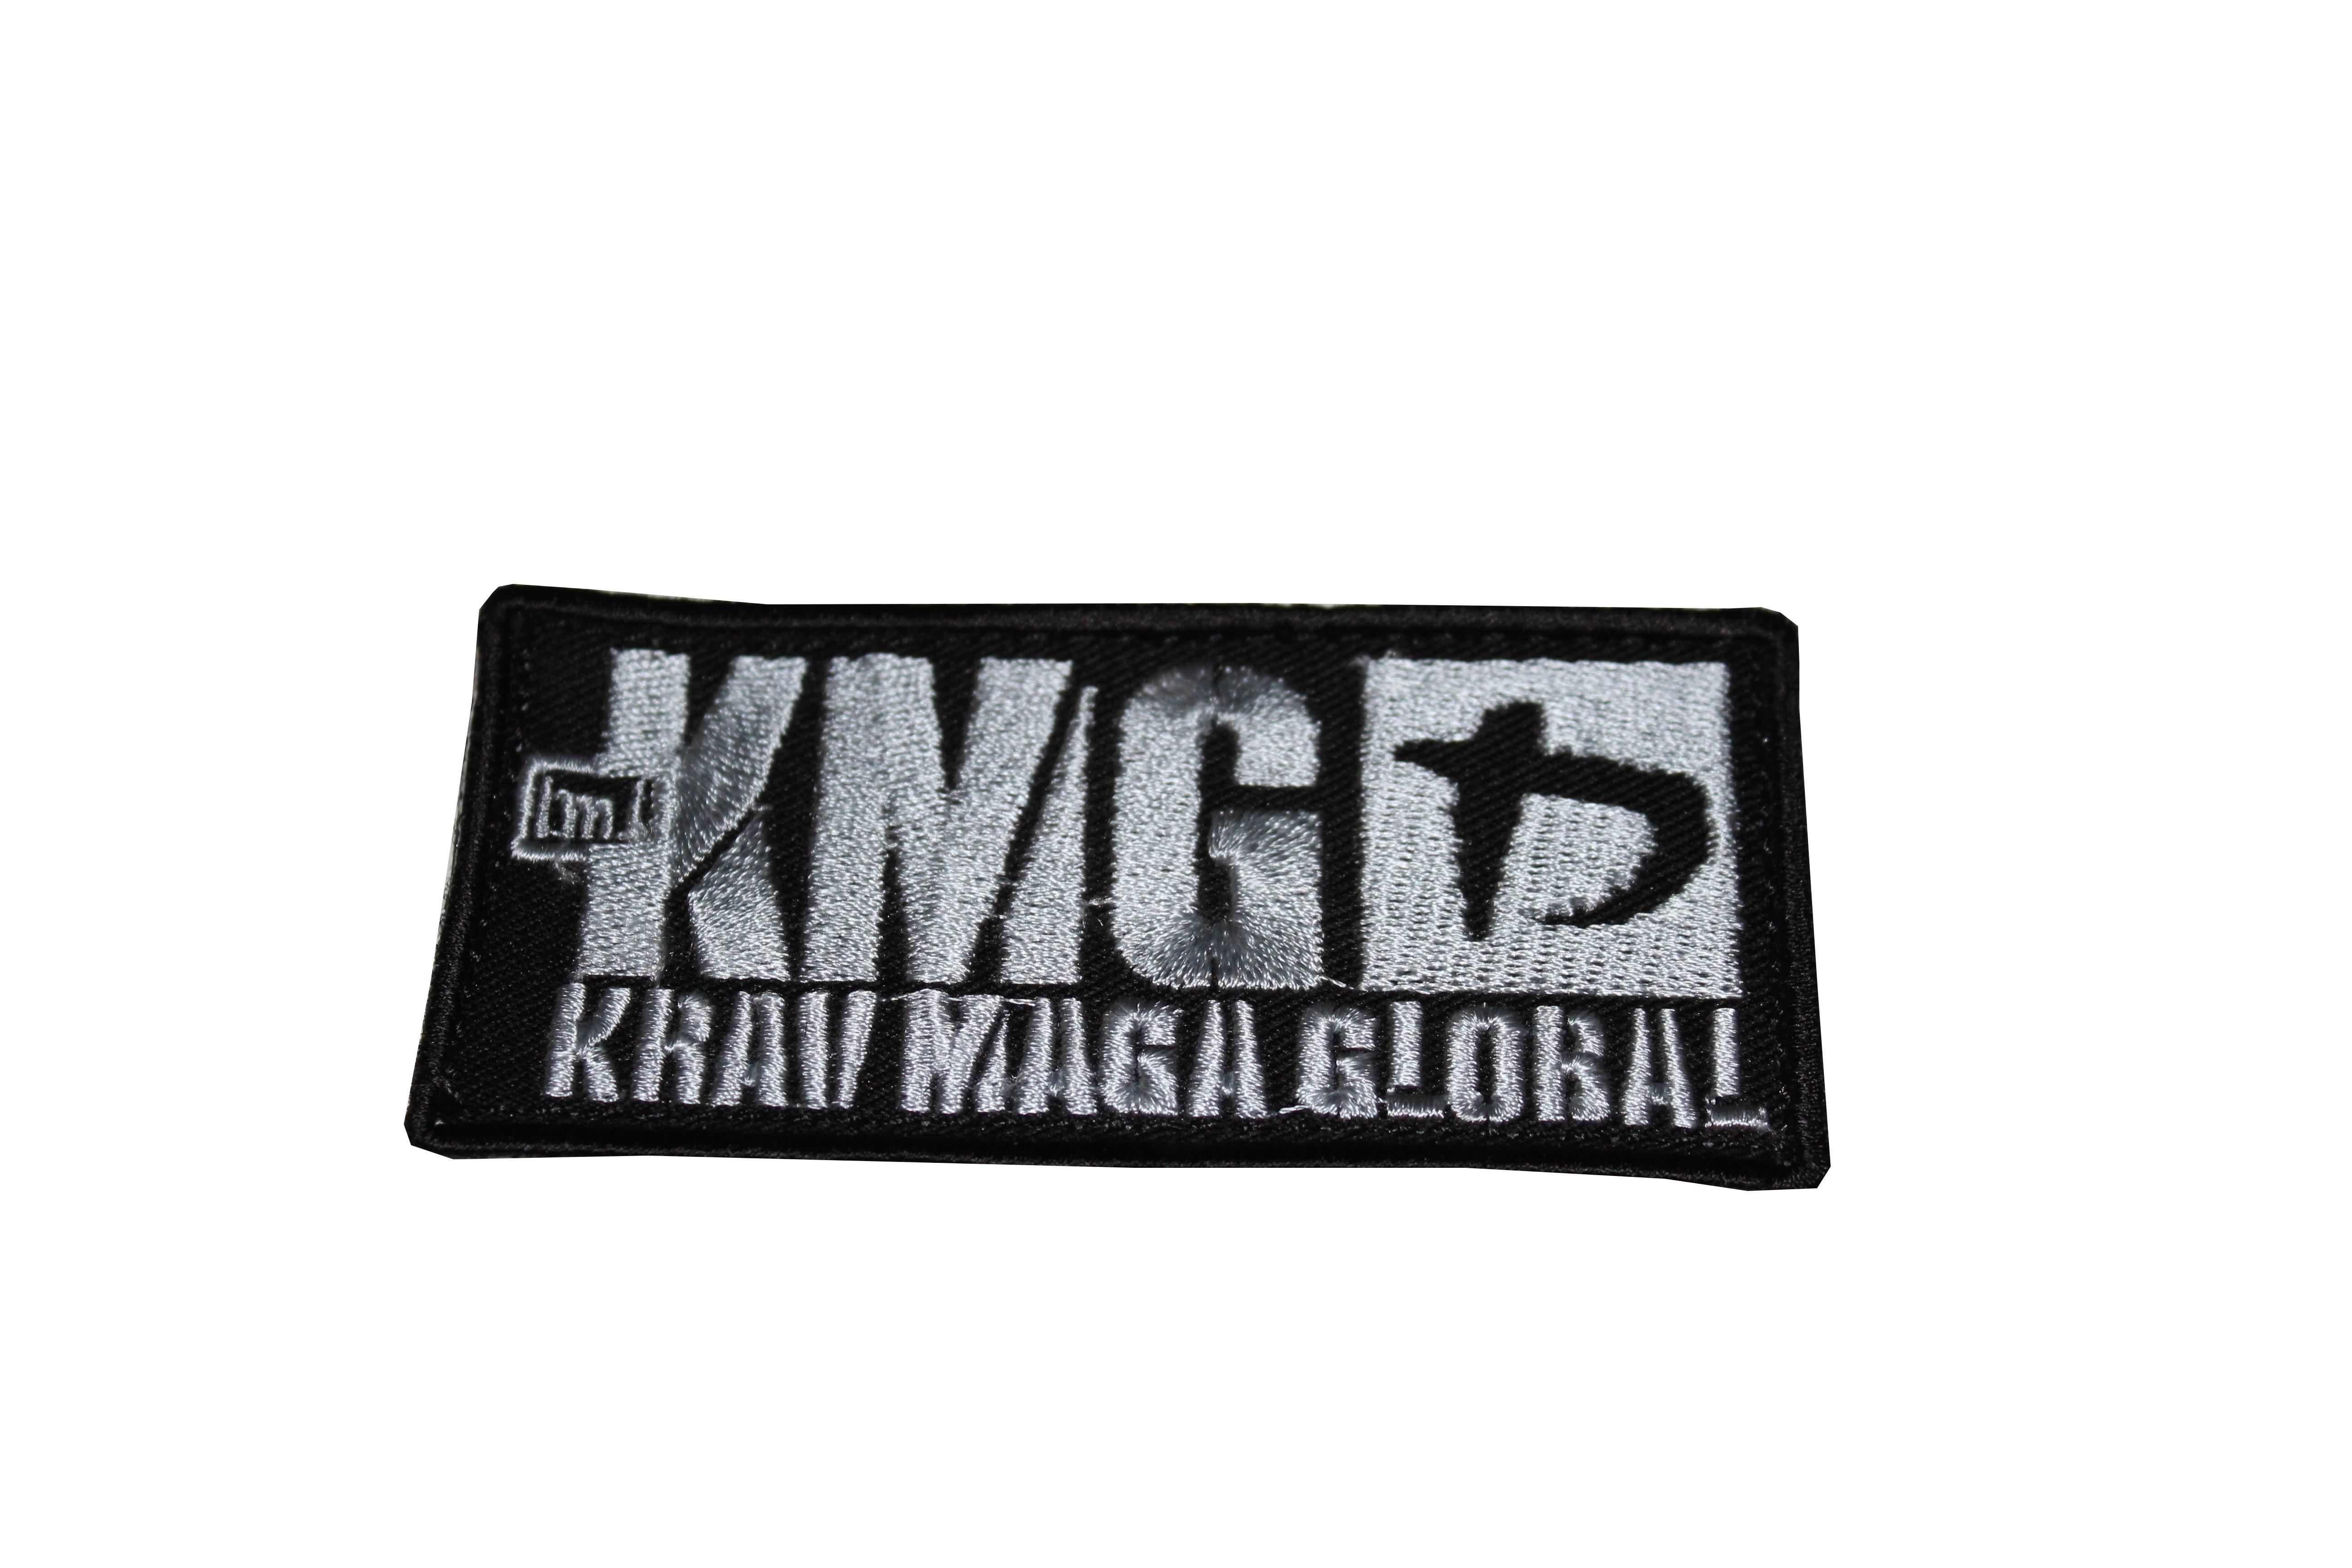 IKMF instructor patch